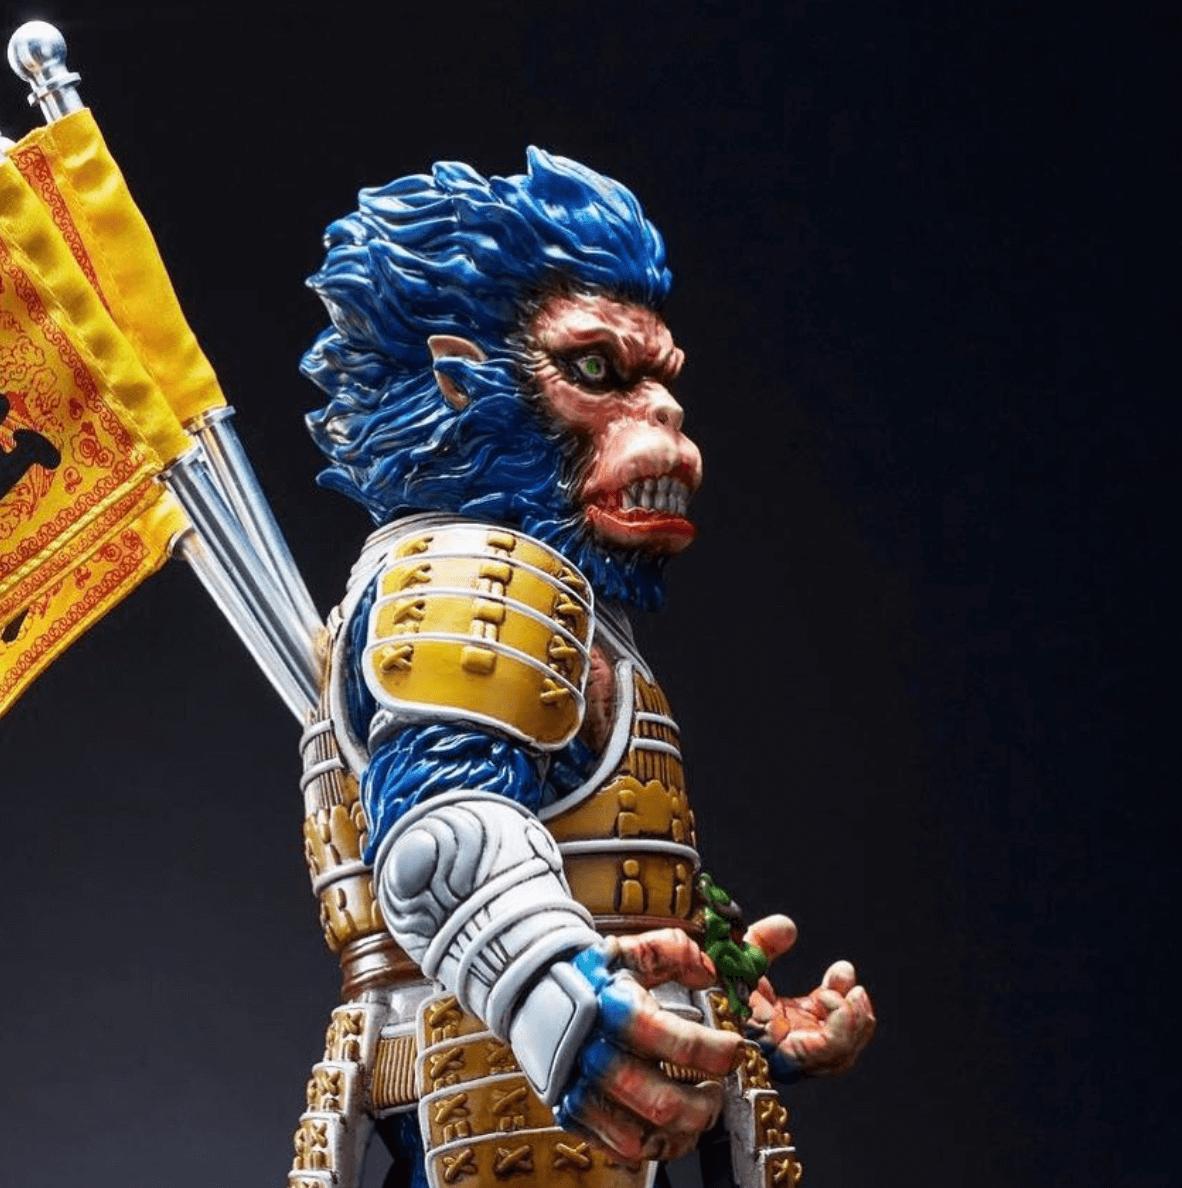 The Toy Chronicle Kaiju One Designercon 2017